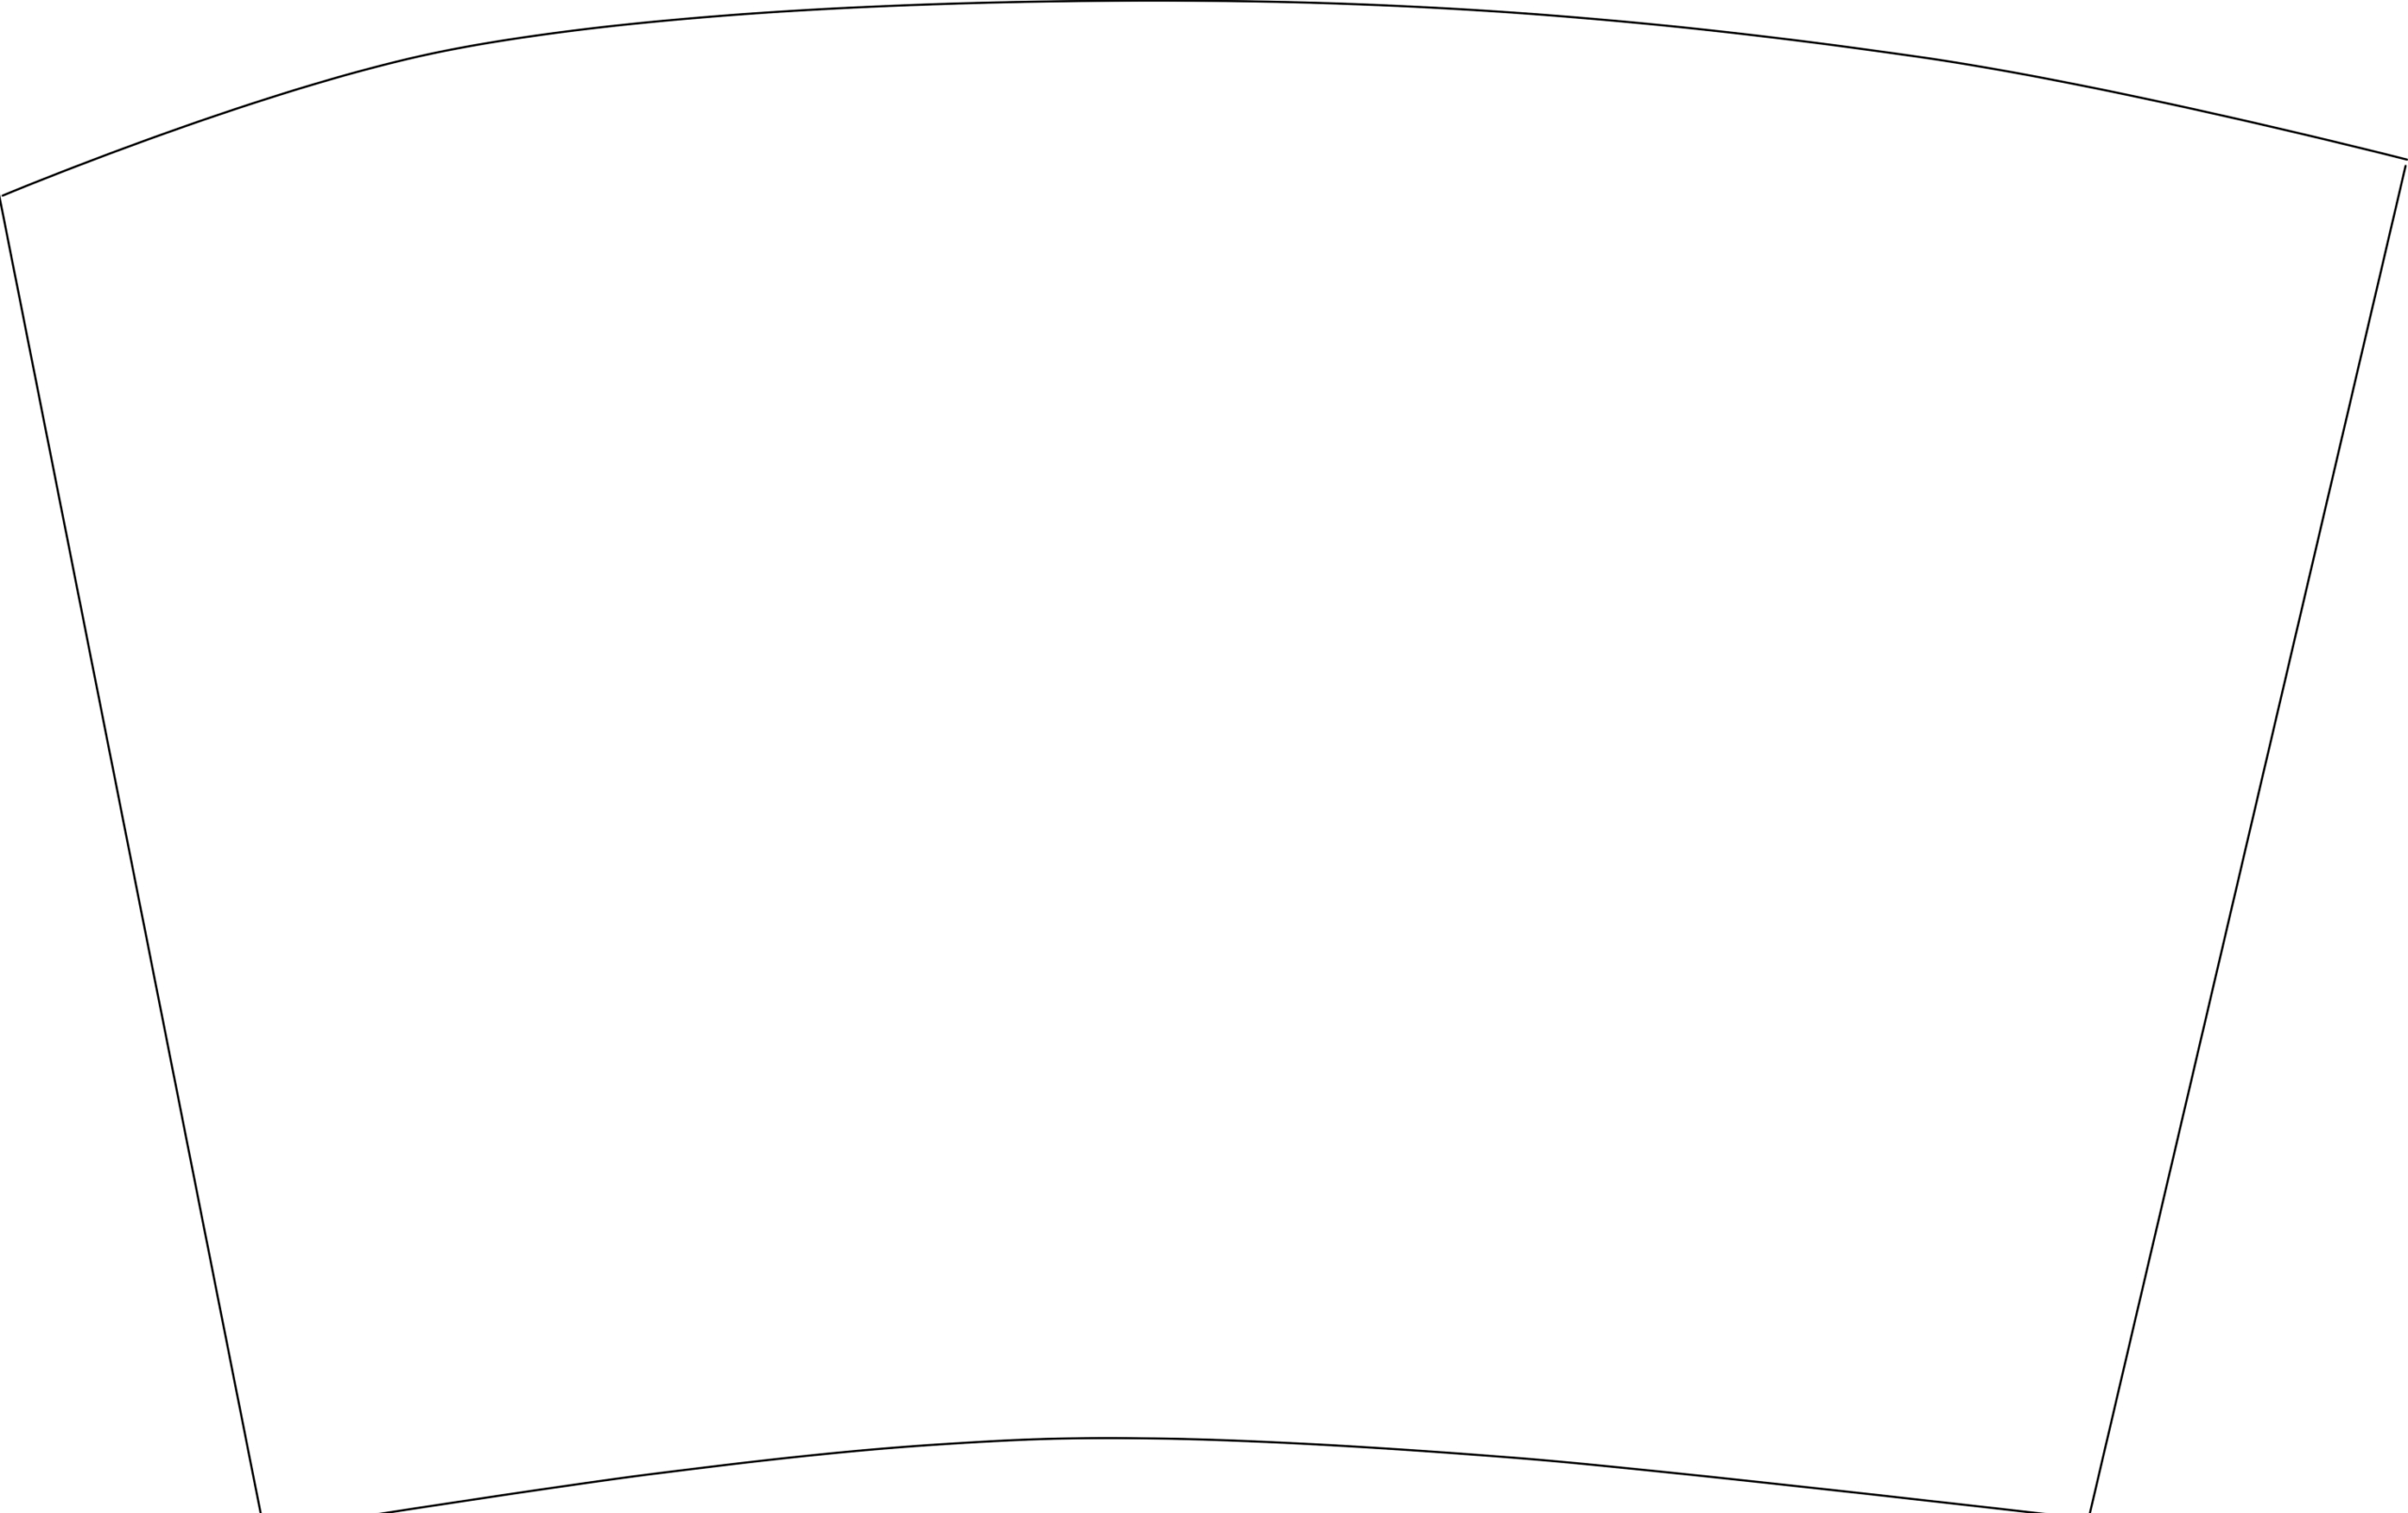 Tumbler Design Template - Gisa Pertaining To Starbucks Create Your Own Tumbler Blank Template